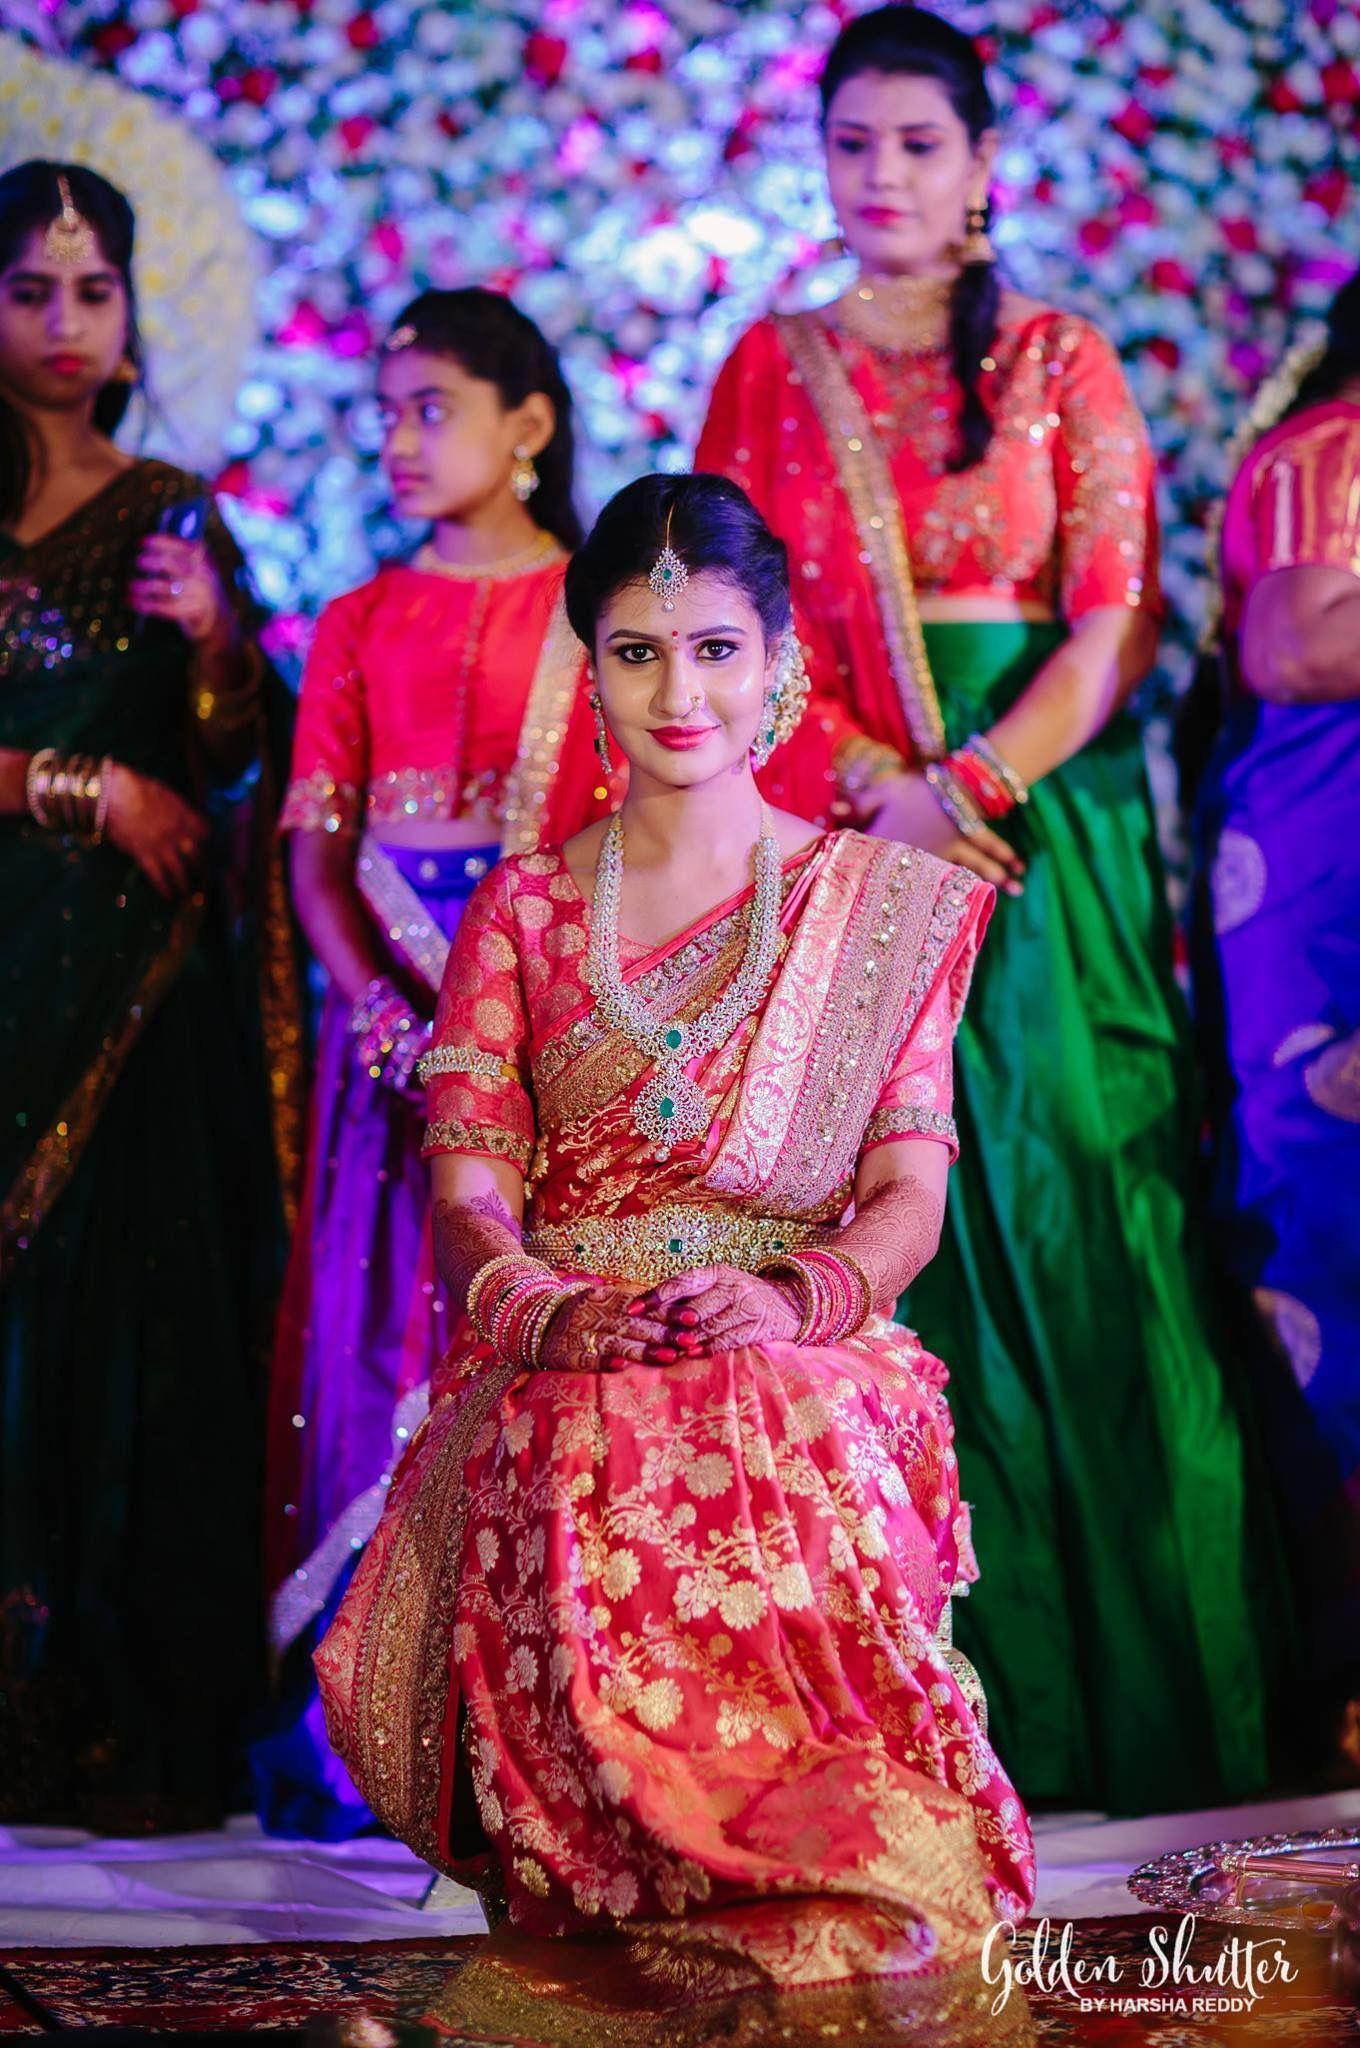 South Indian,Telugu bride   Indian Bridal   Pinterest   Telugu ...